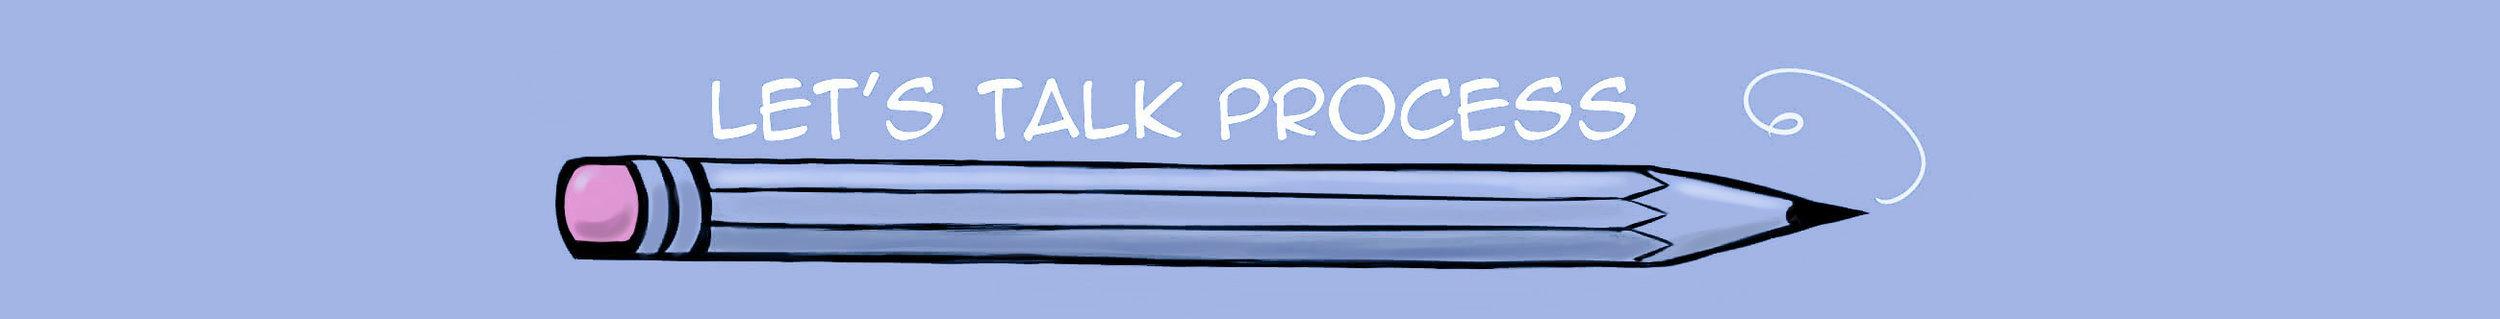 Let's talk logo final.jpg